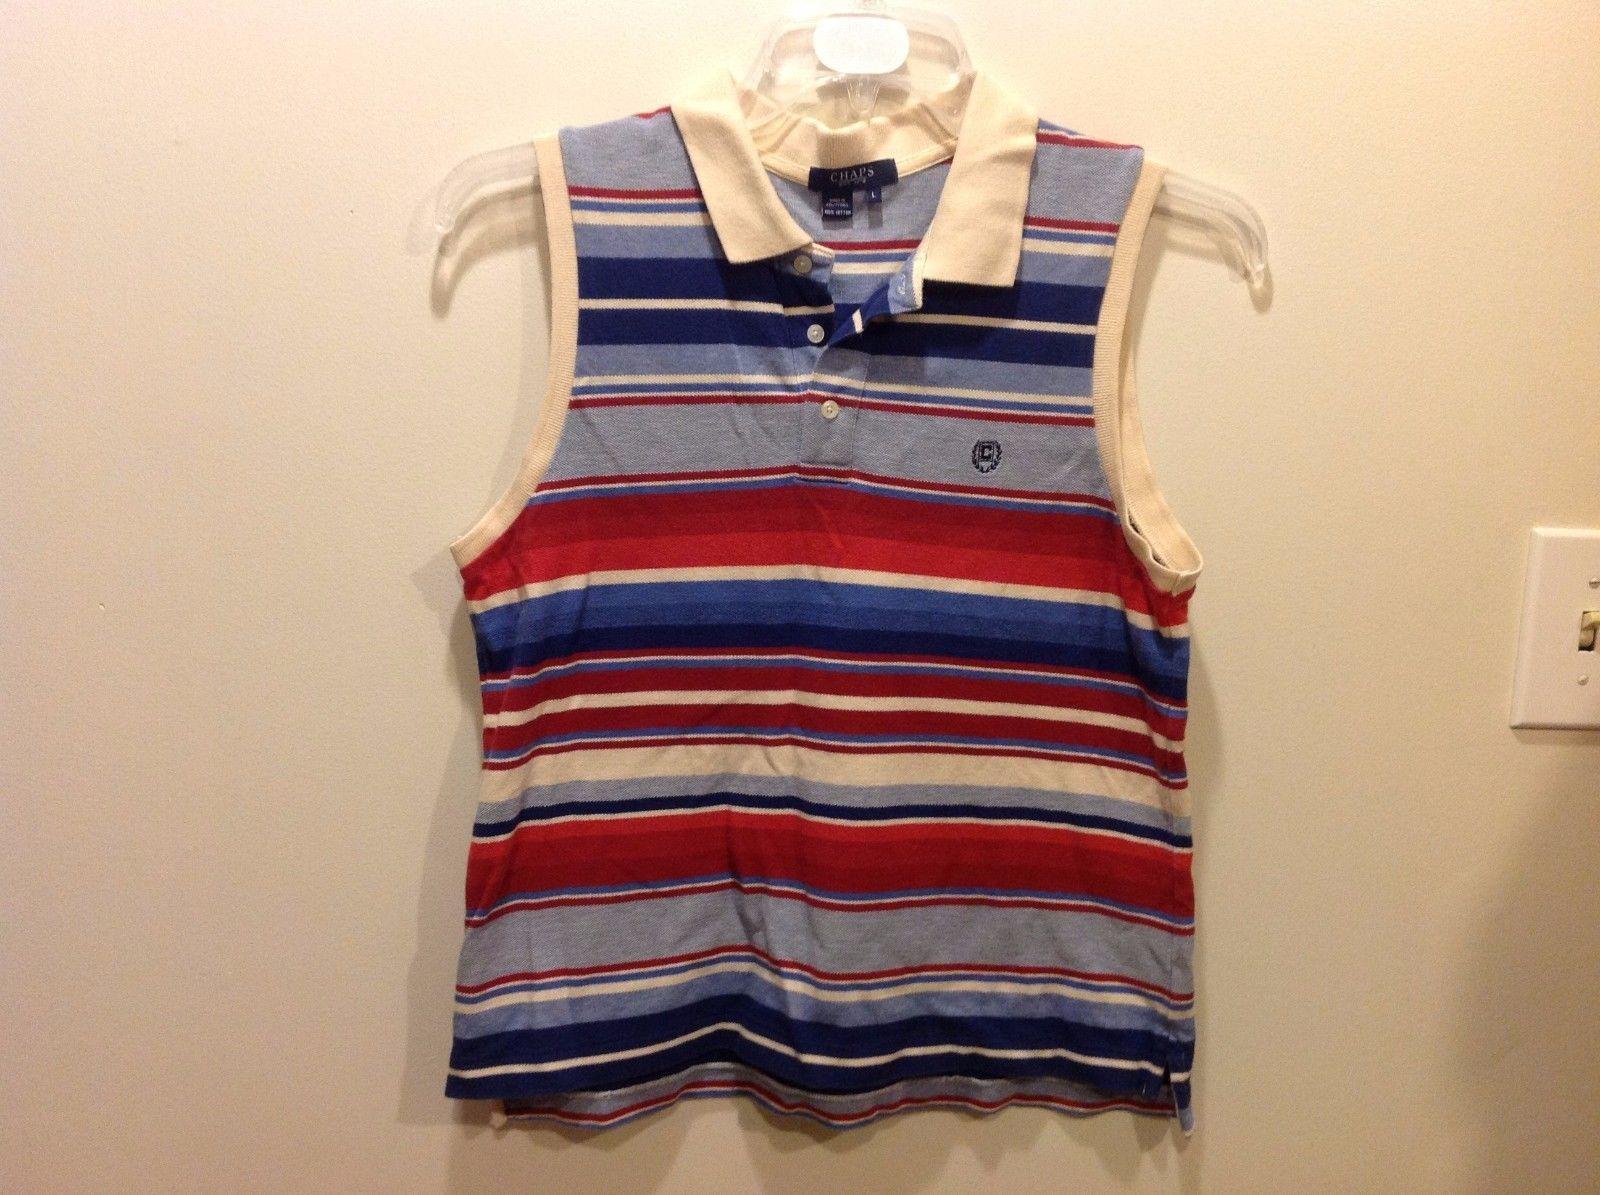 CHAPS Classy Horizontally Striped Sleeveless MultiColor POLO Shirt Sz LG